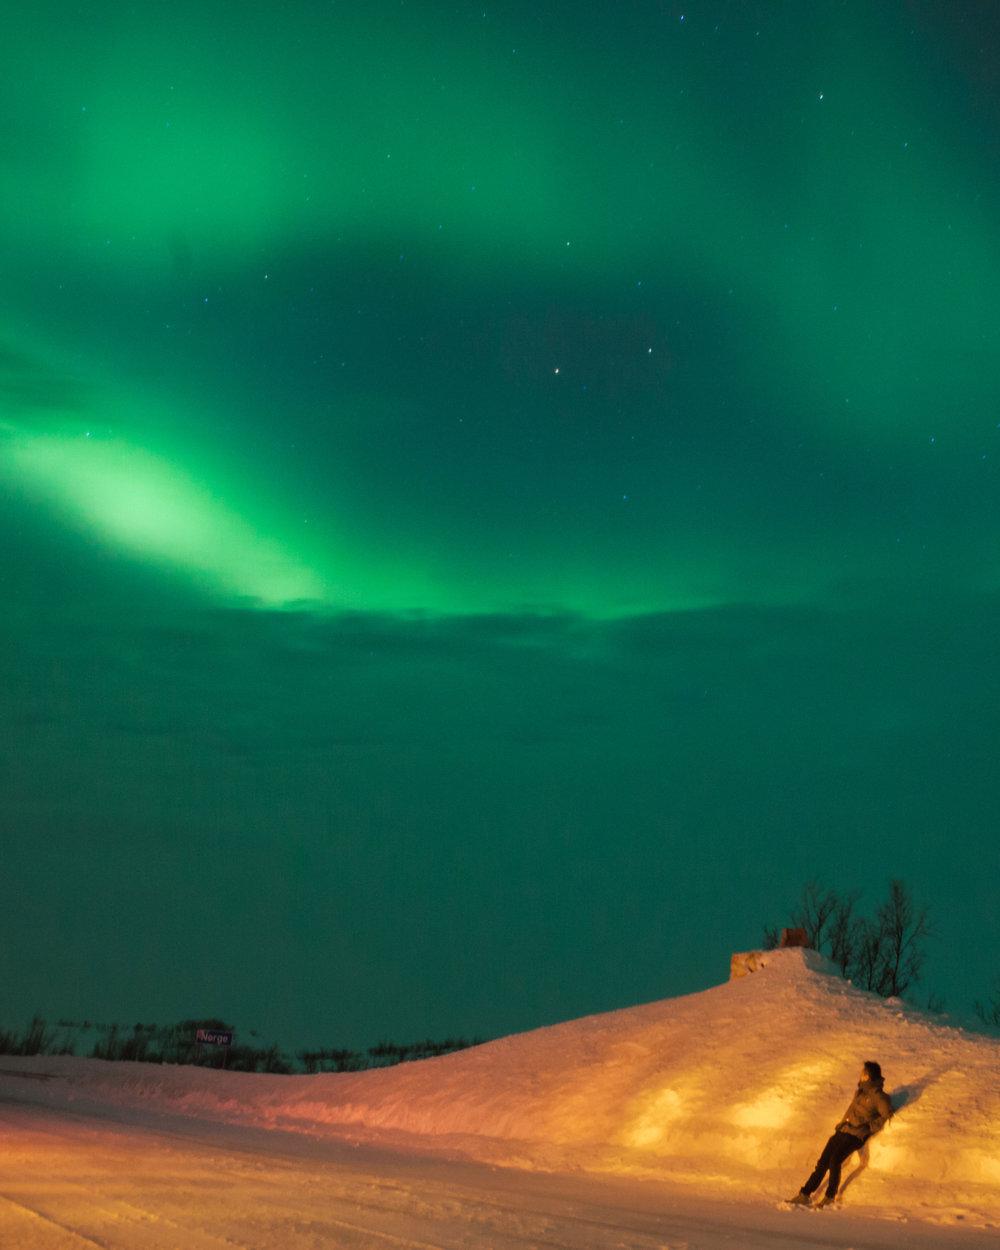 chasing-northern-light-in-tromso2.jpg